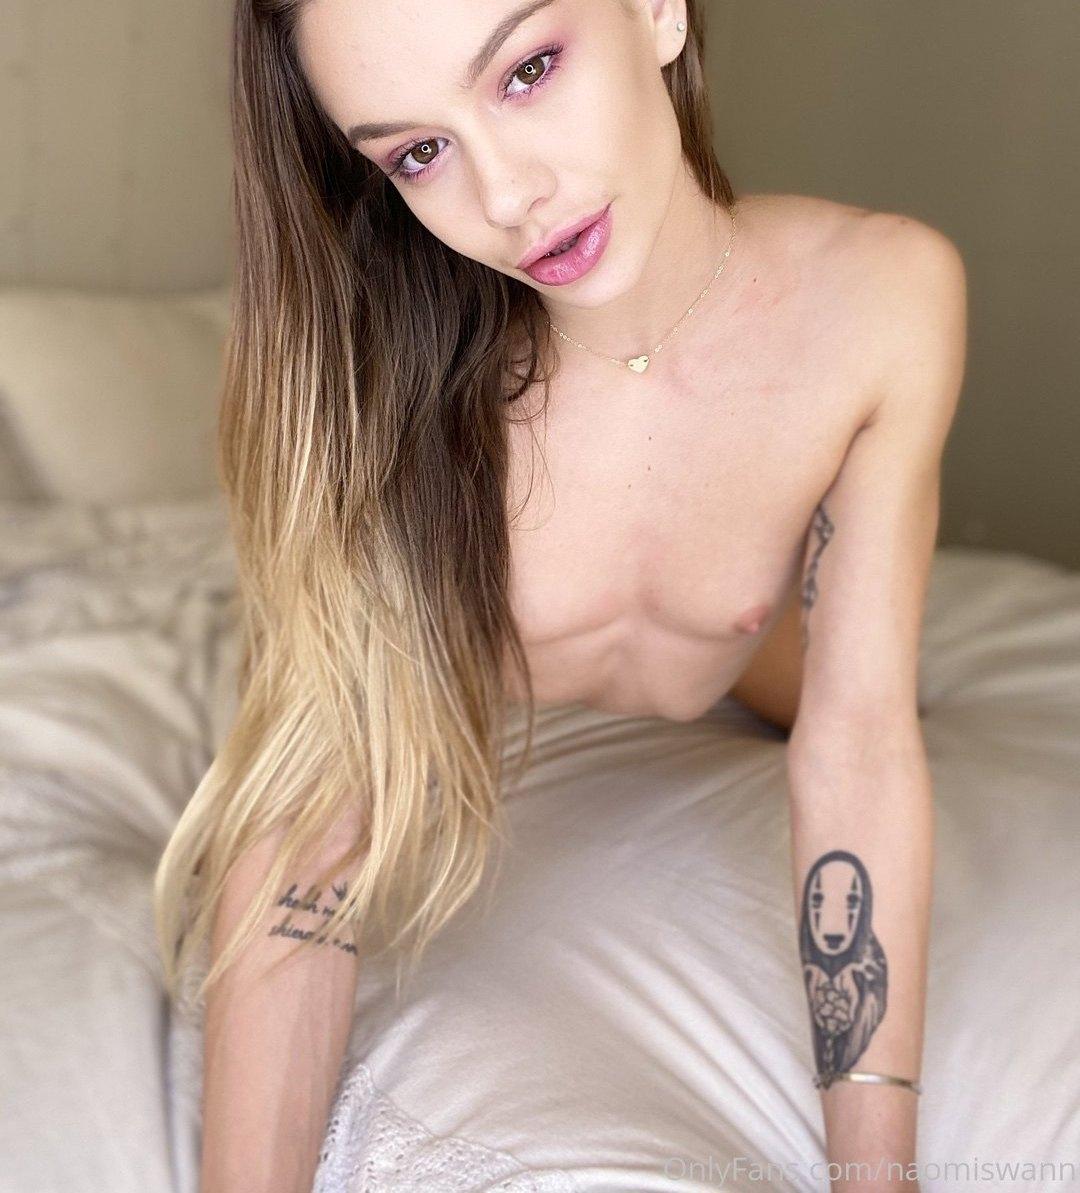 Naomi Swann Naomiswann Onlyfans Nudes Leaks 0027